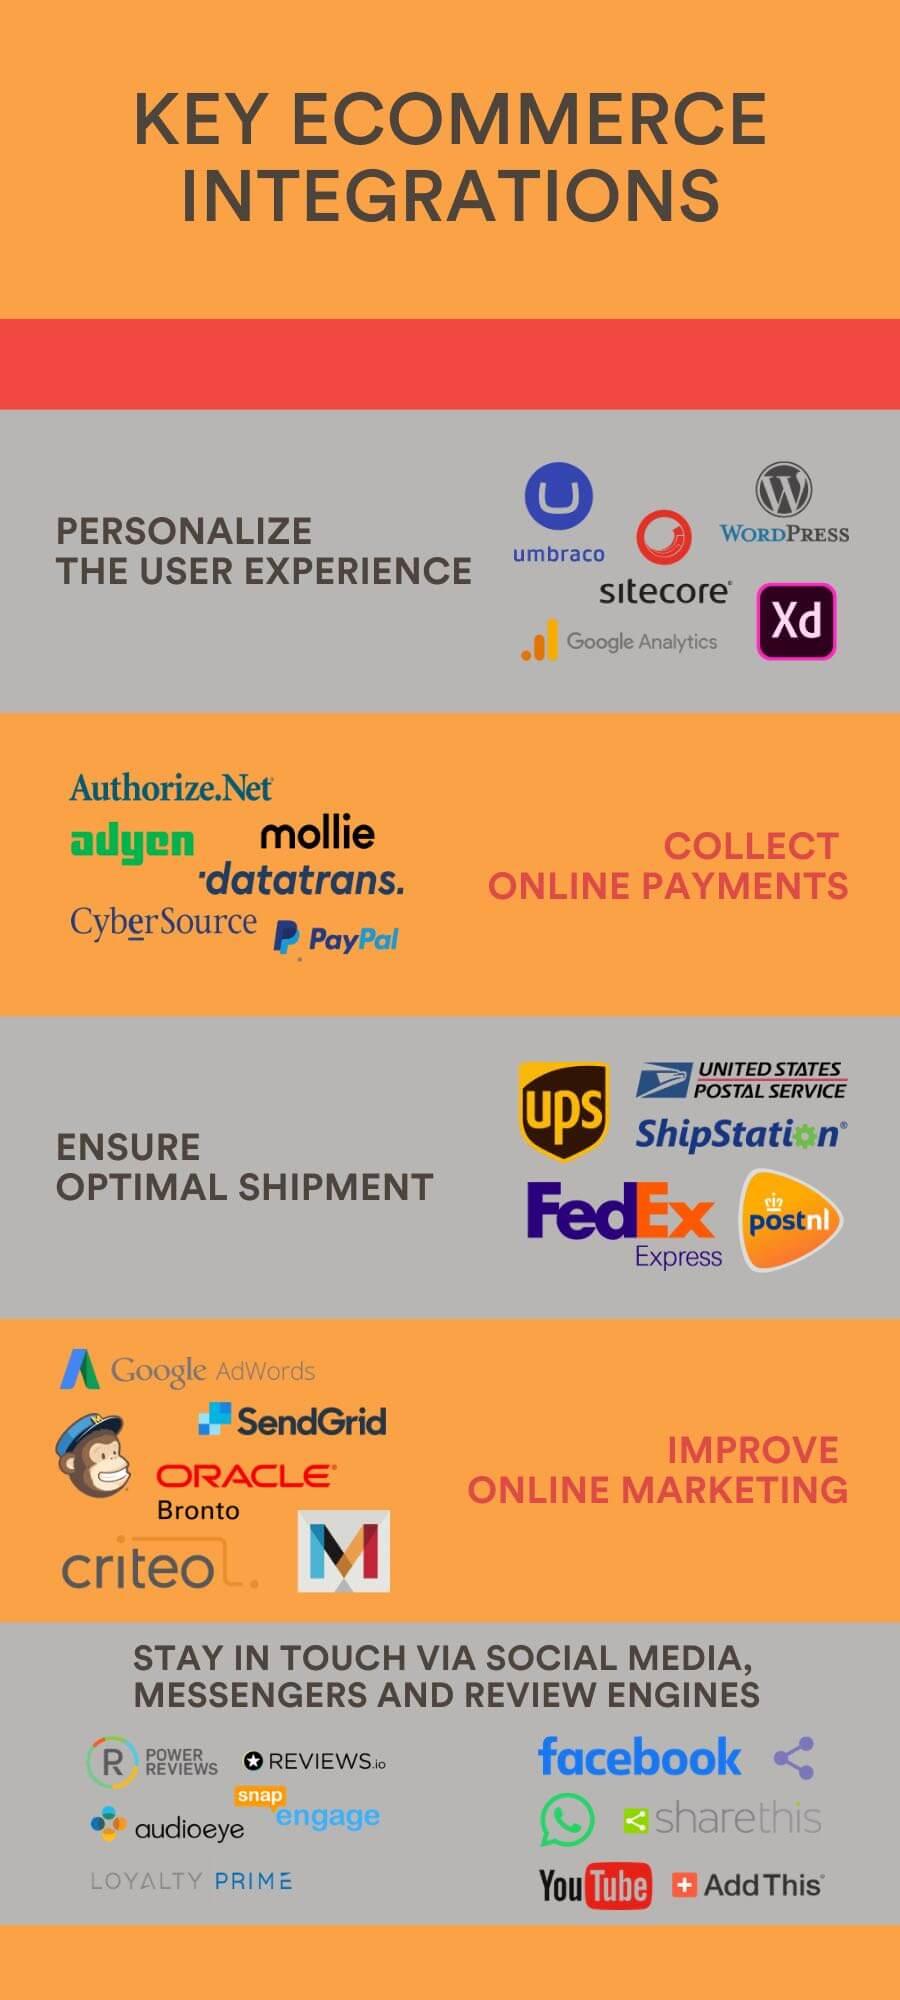 key ecommerce integrations